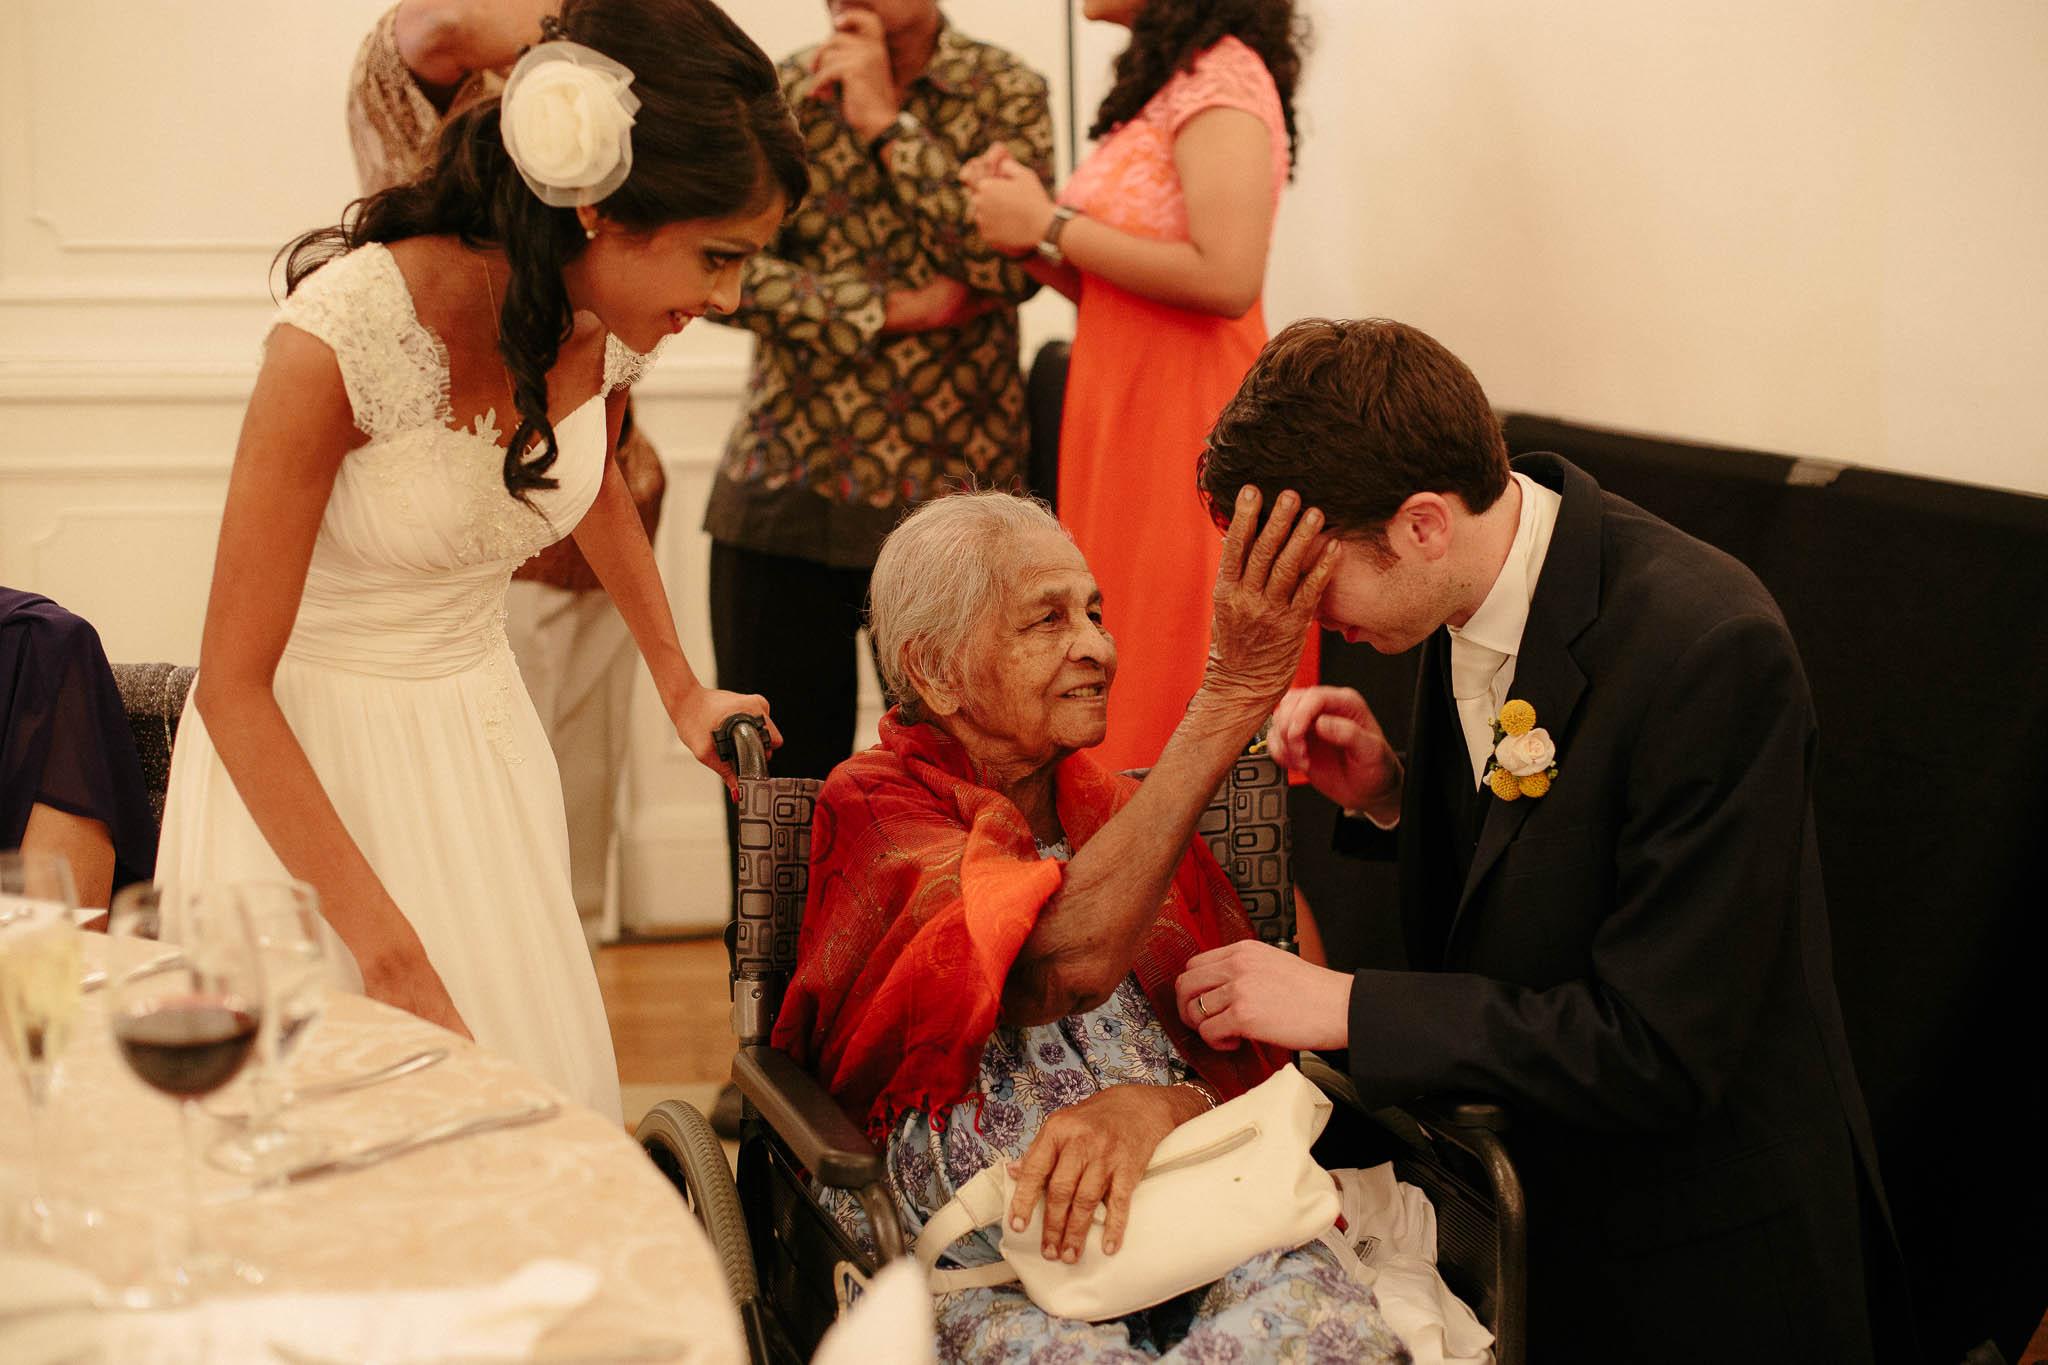 singapore-wedding-photographer-malay-indian-pre-wedding-travel-wmt-2015-45.jpg